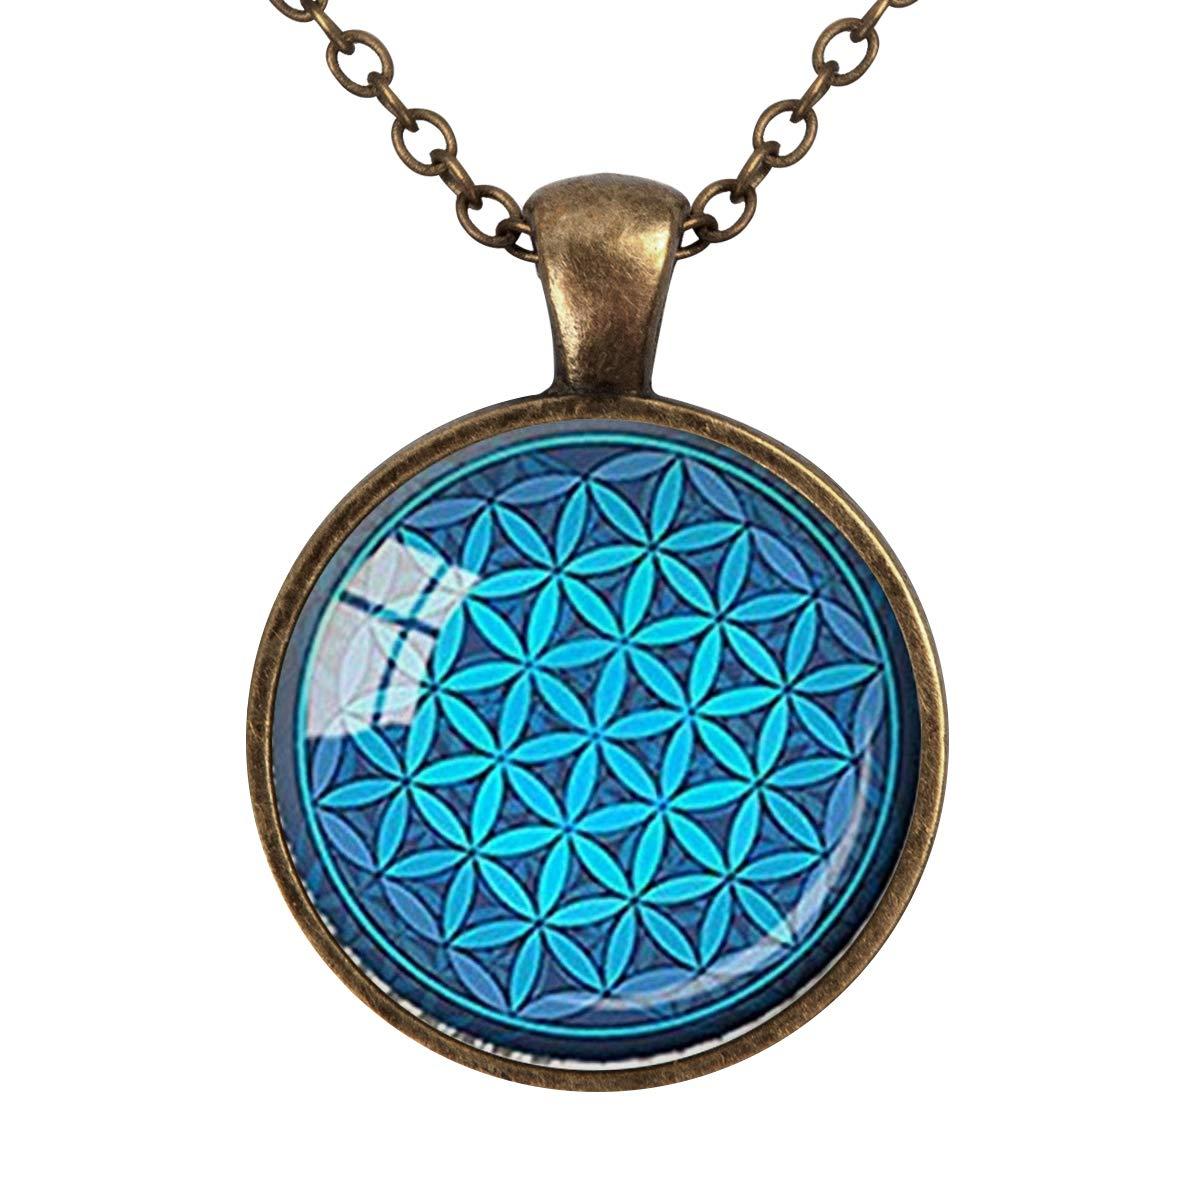 Vintage OM Flower of Life Cabochon Glass Bronze Chain Pendant Necklace